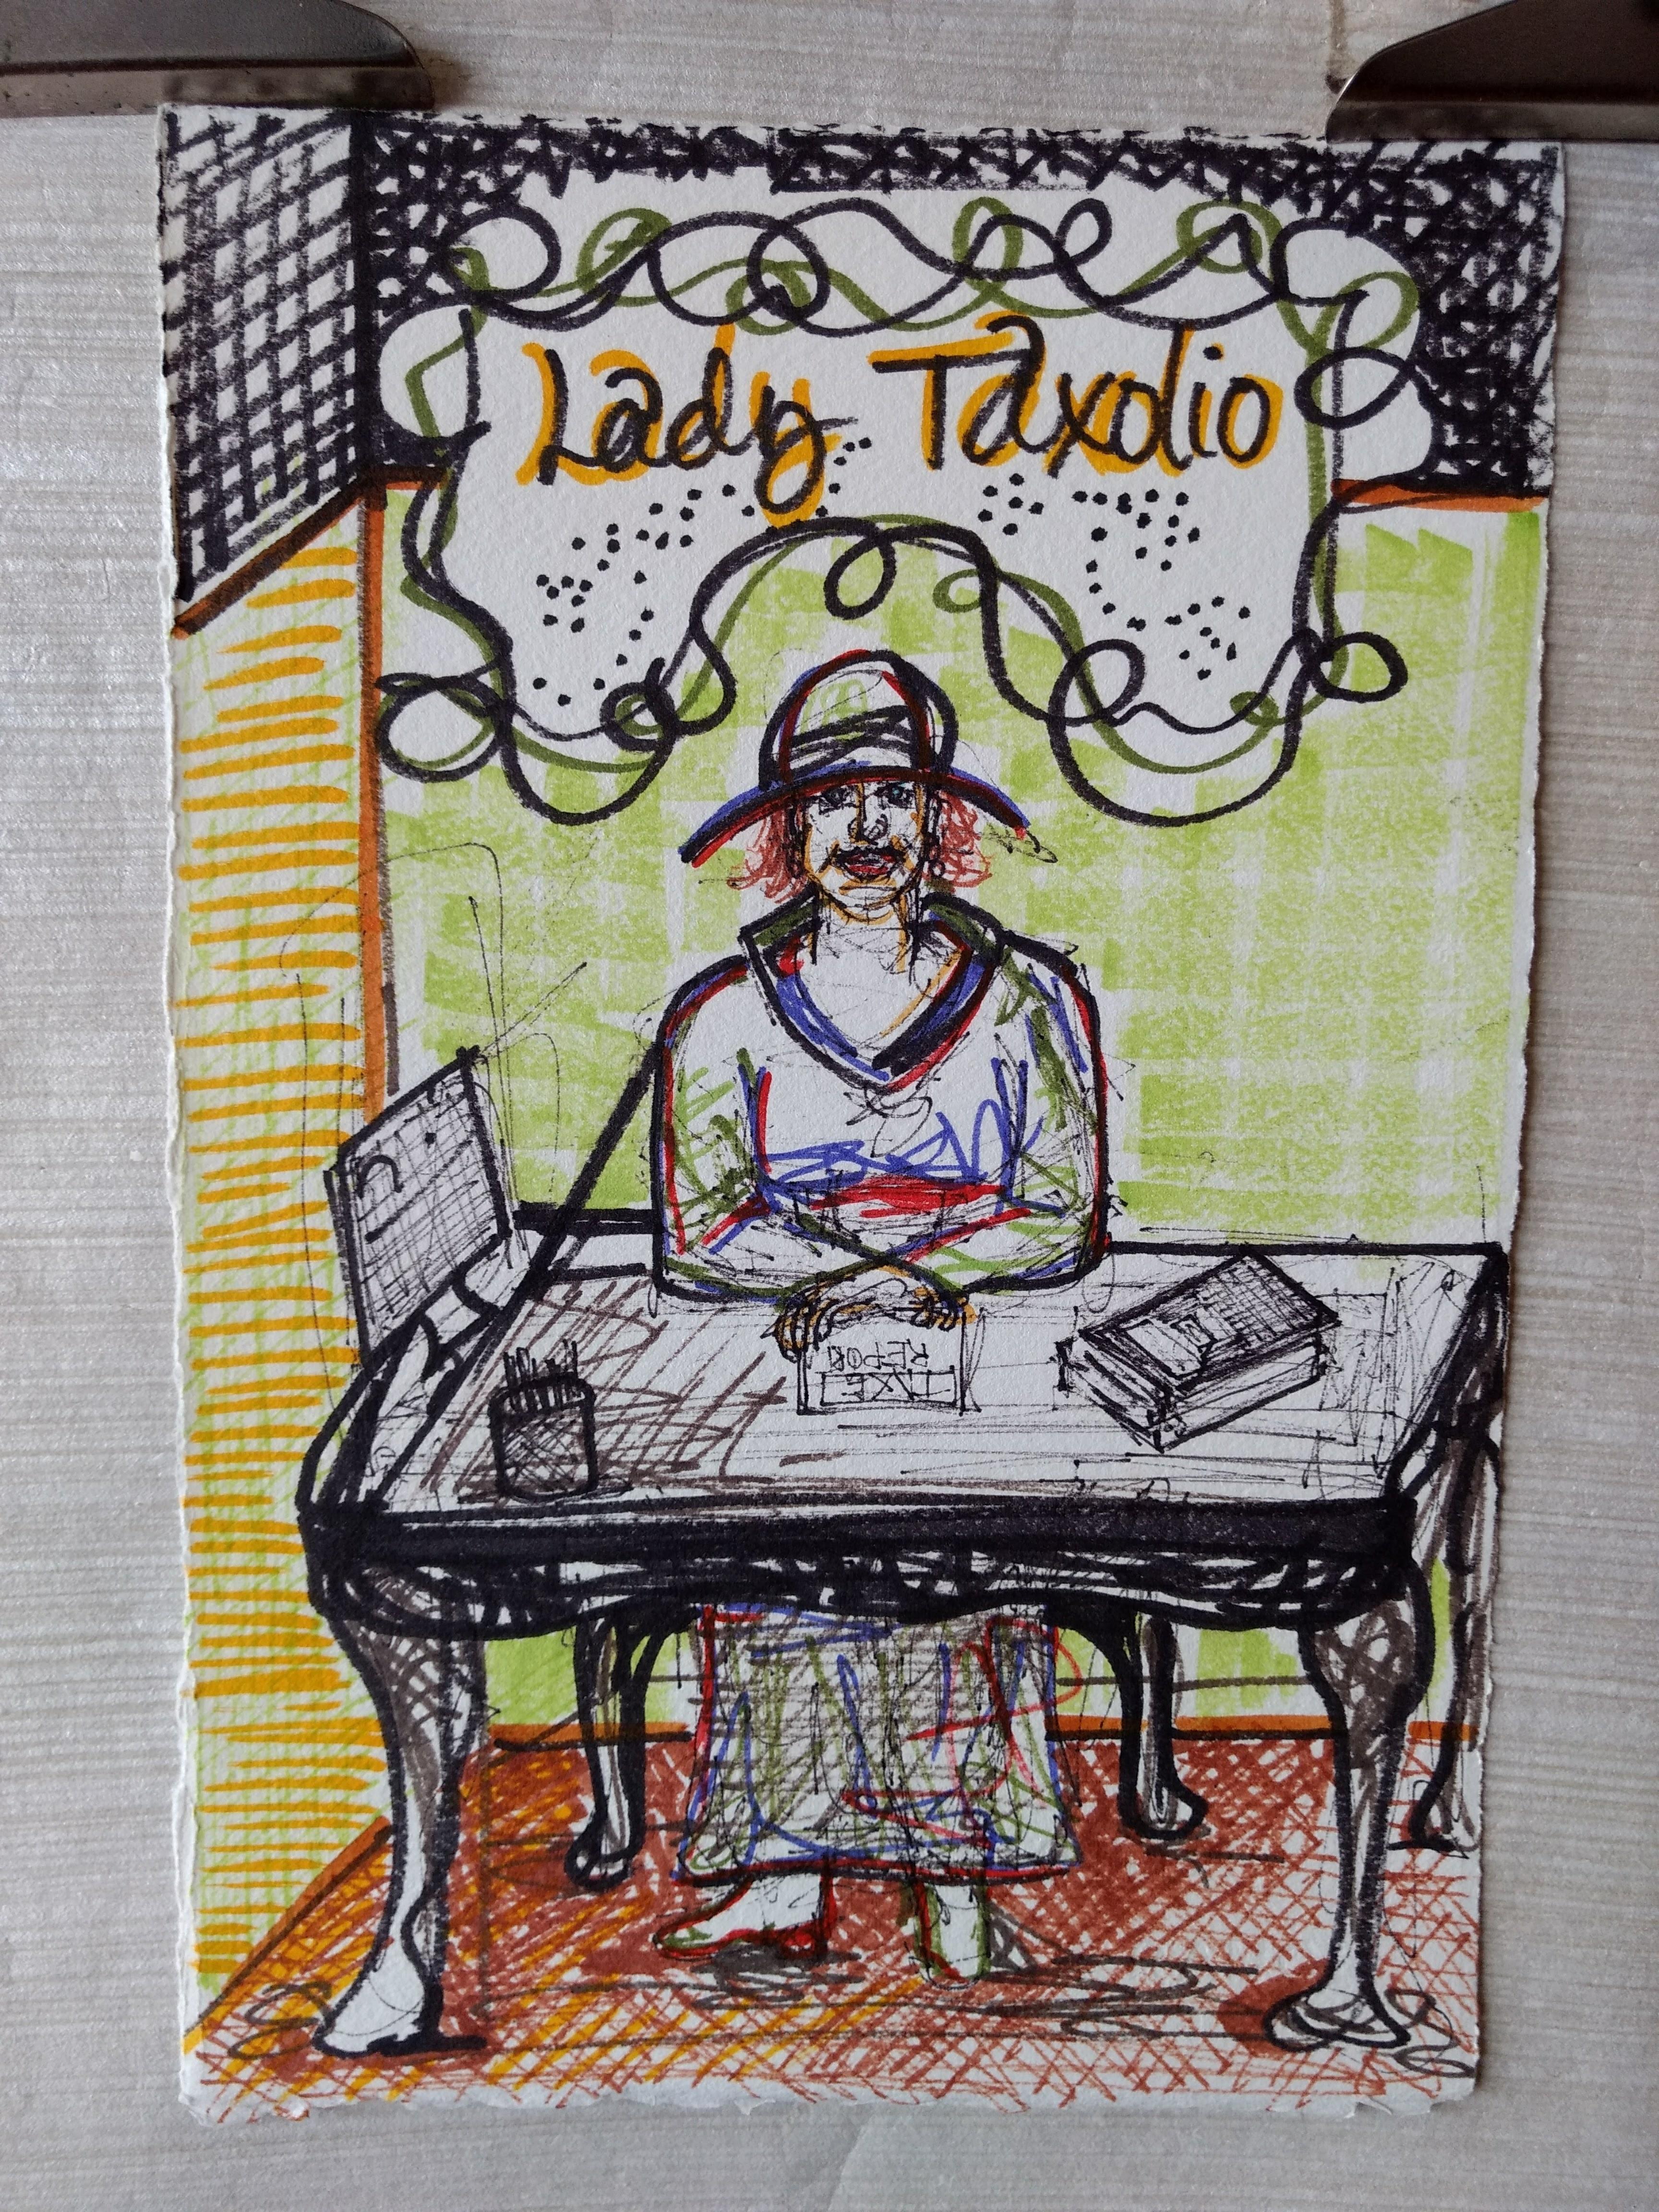 Lady Taxolio